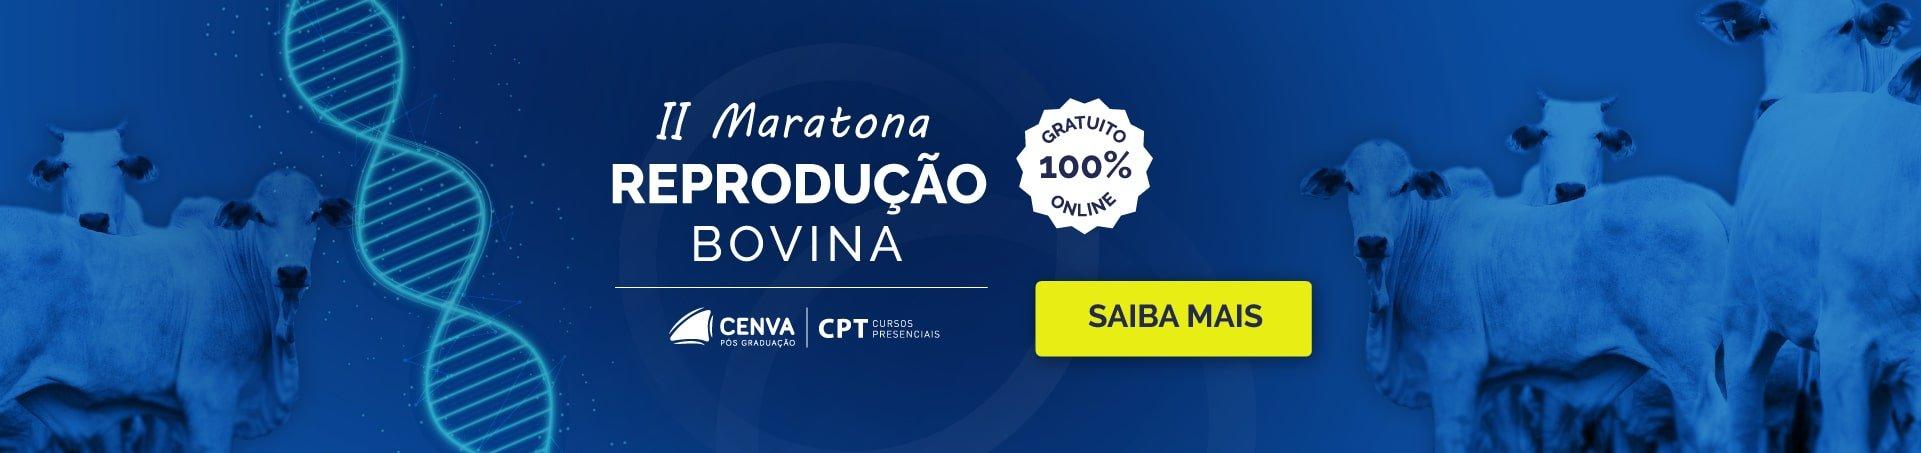 II Maratona da Reprodução Bovina